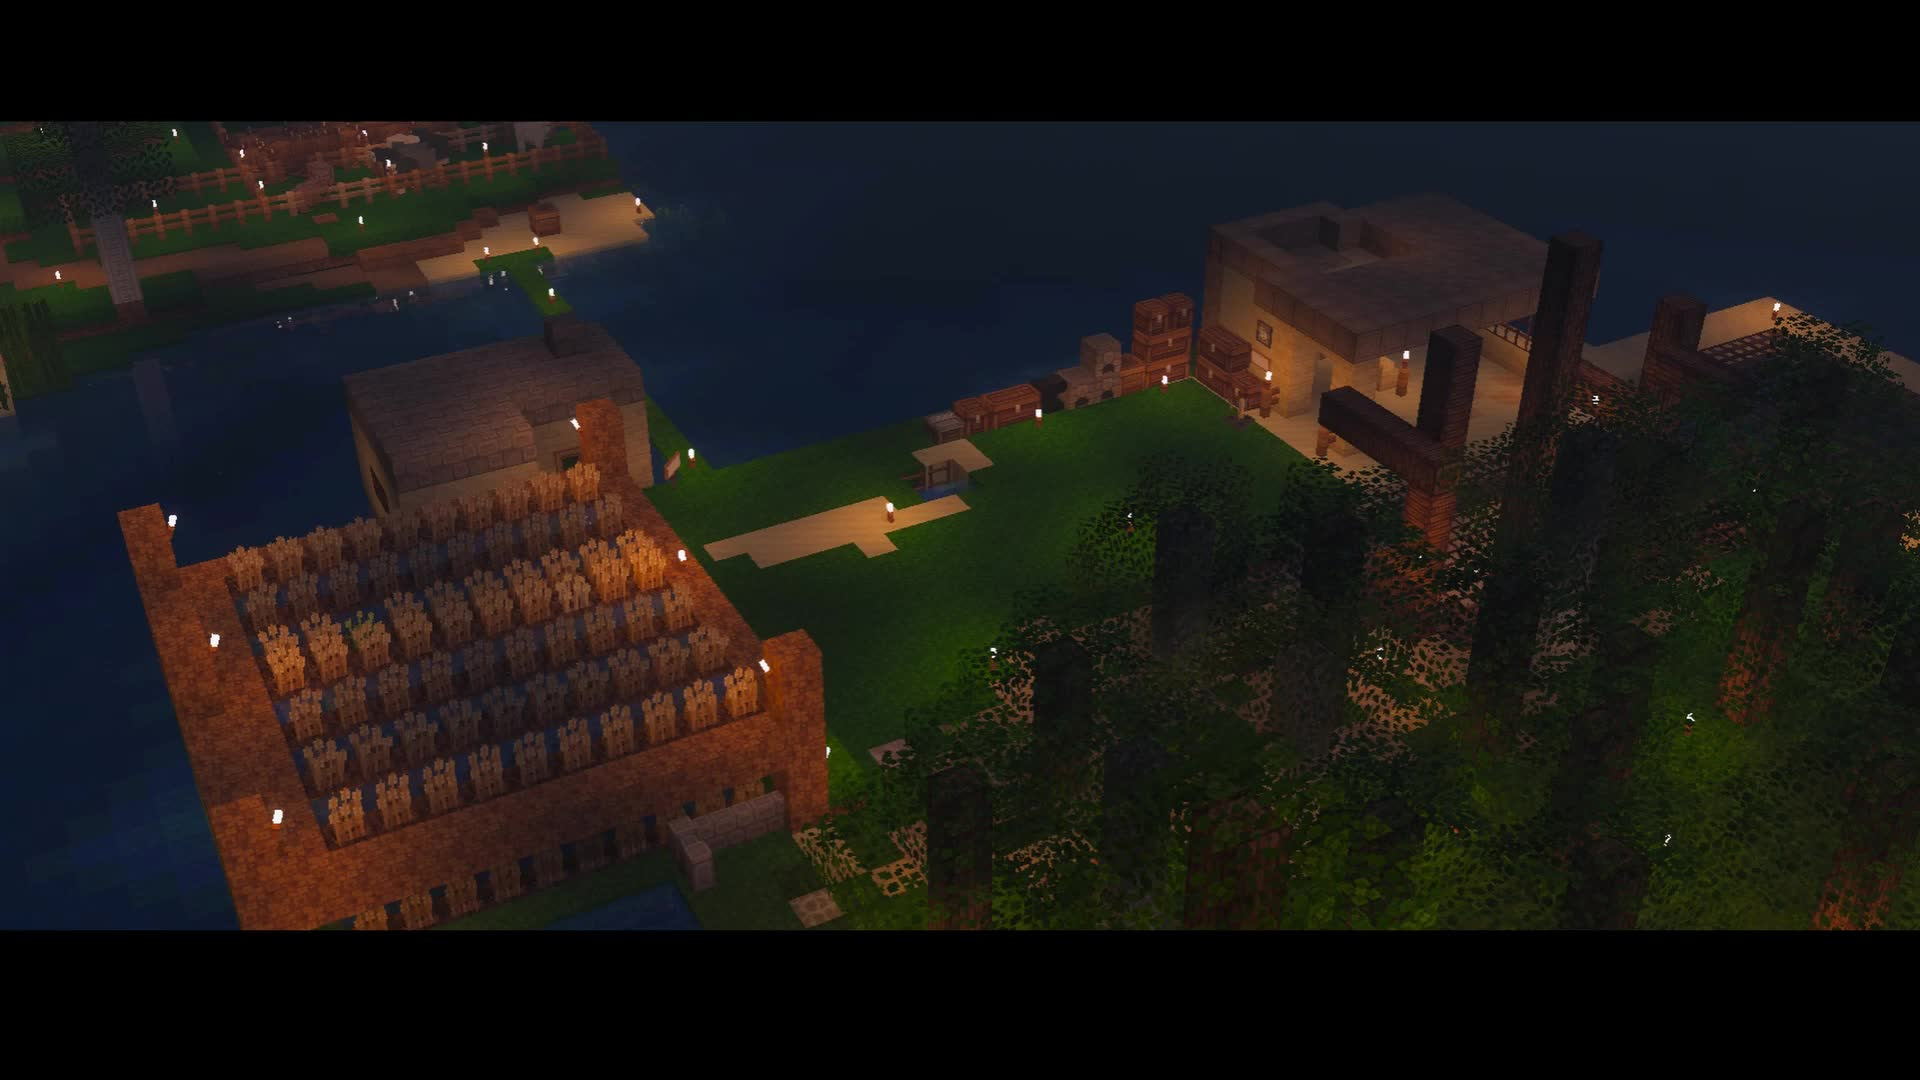 Caleb Newton, minecraft, timelapse, Farm Island Timelapse Minecraft GIFs